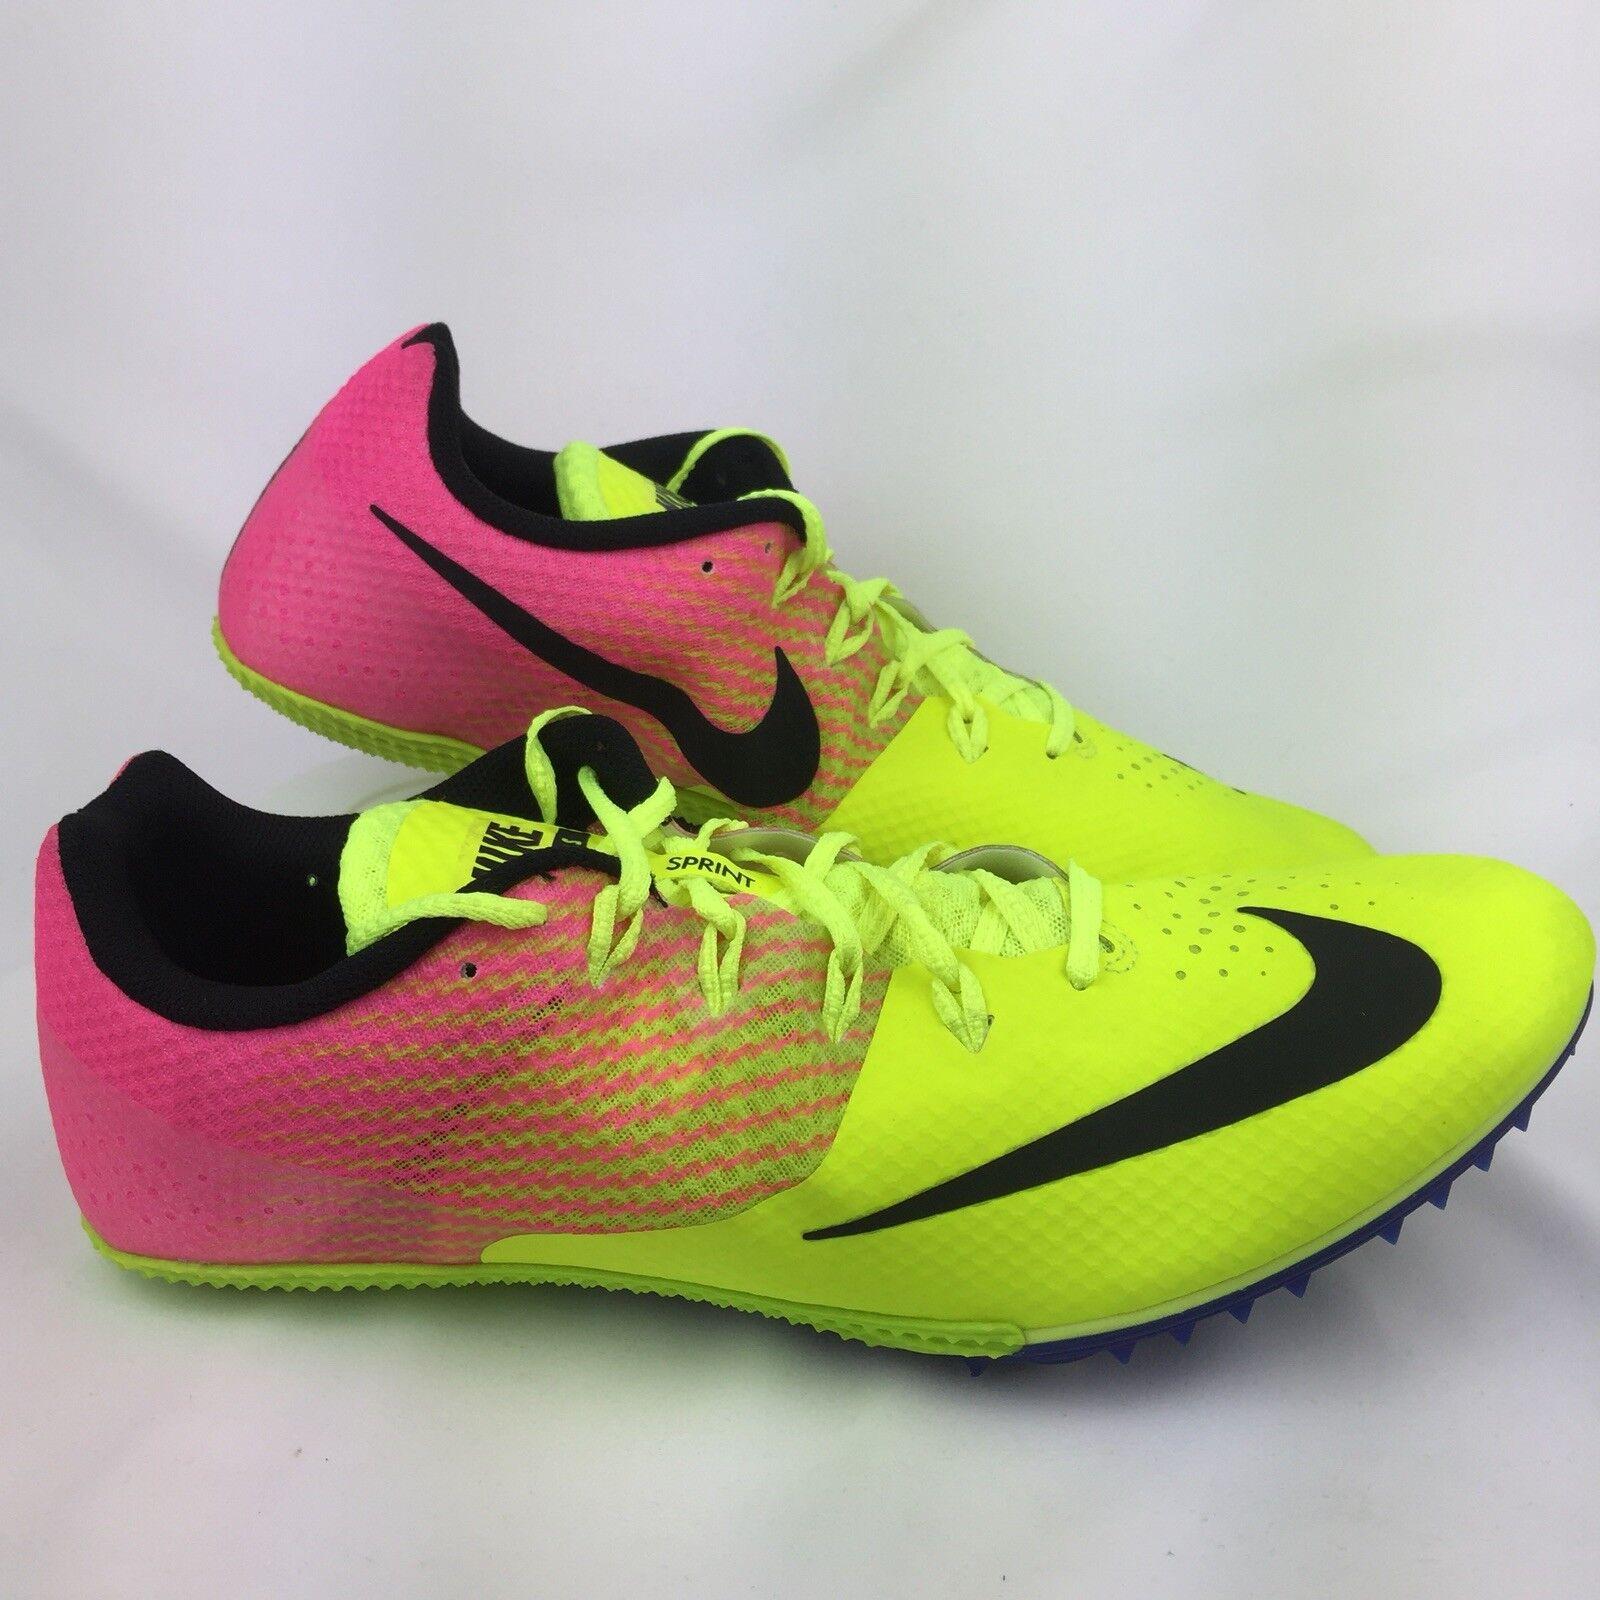 Nike Zoom rival s zapatos 8 Sprint Track spike zapatos s hombre es comodo 943e18